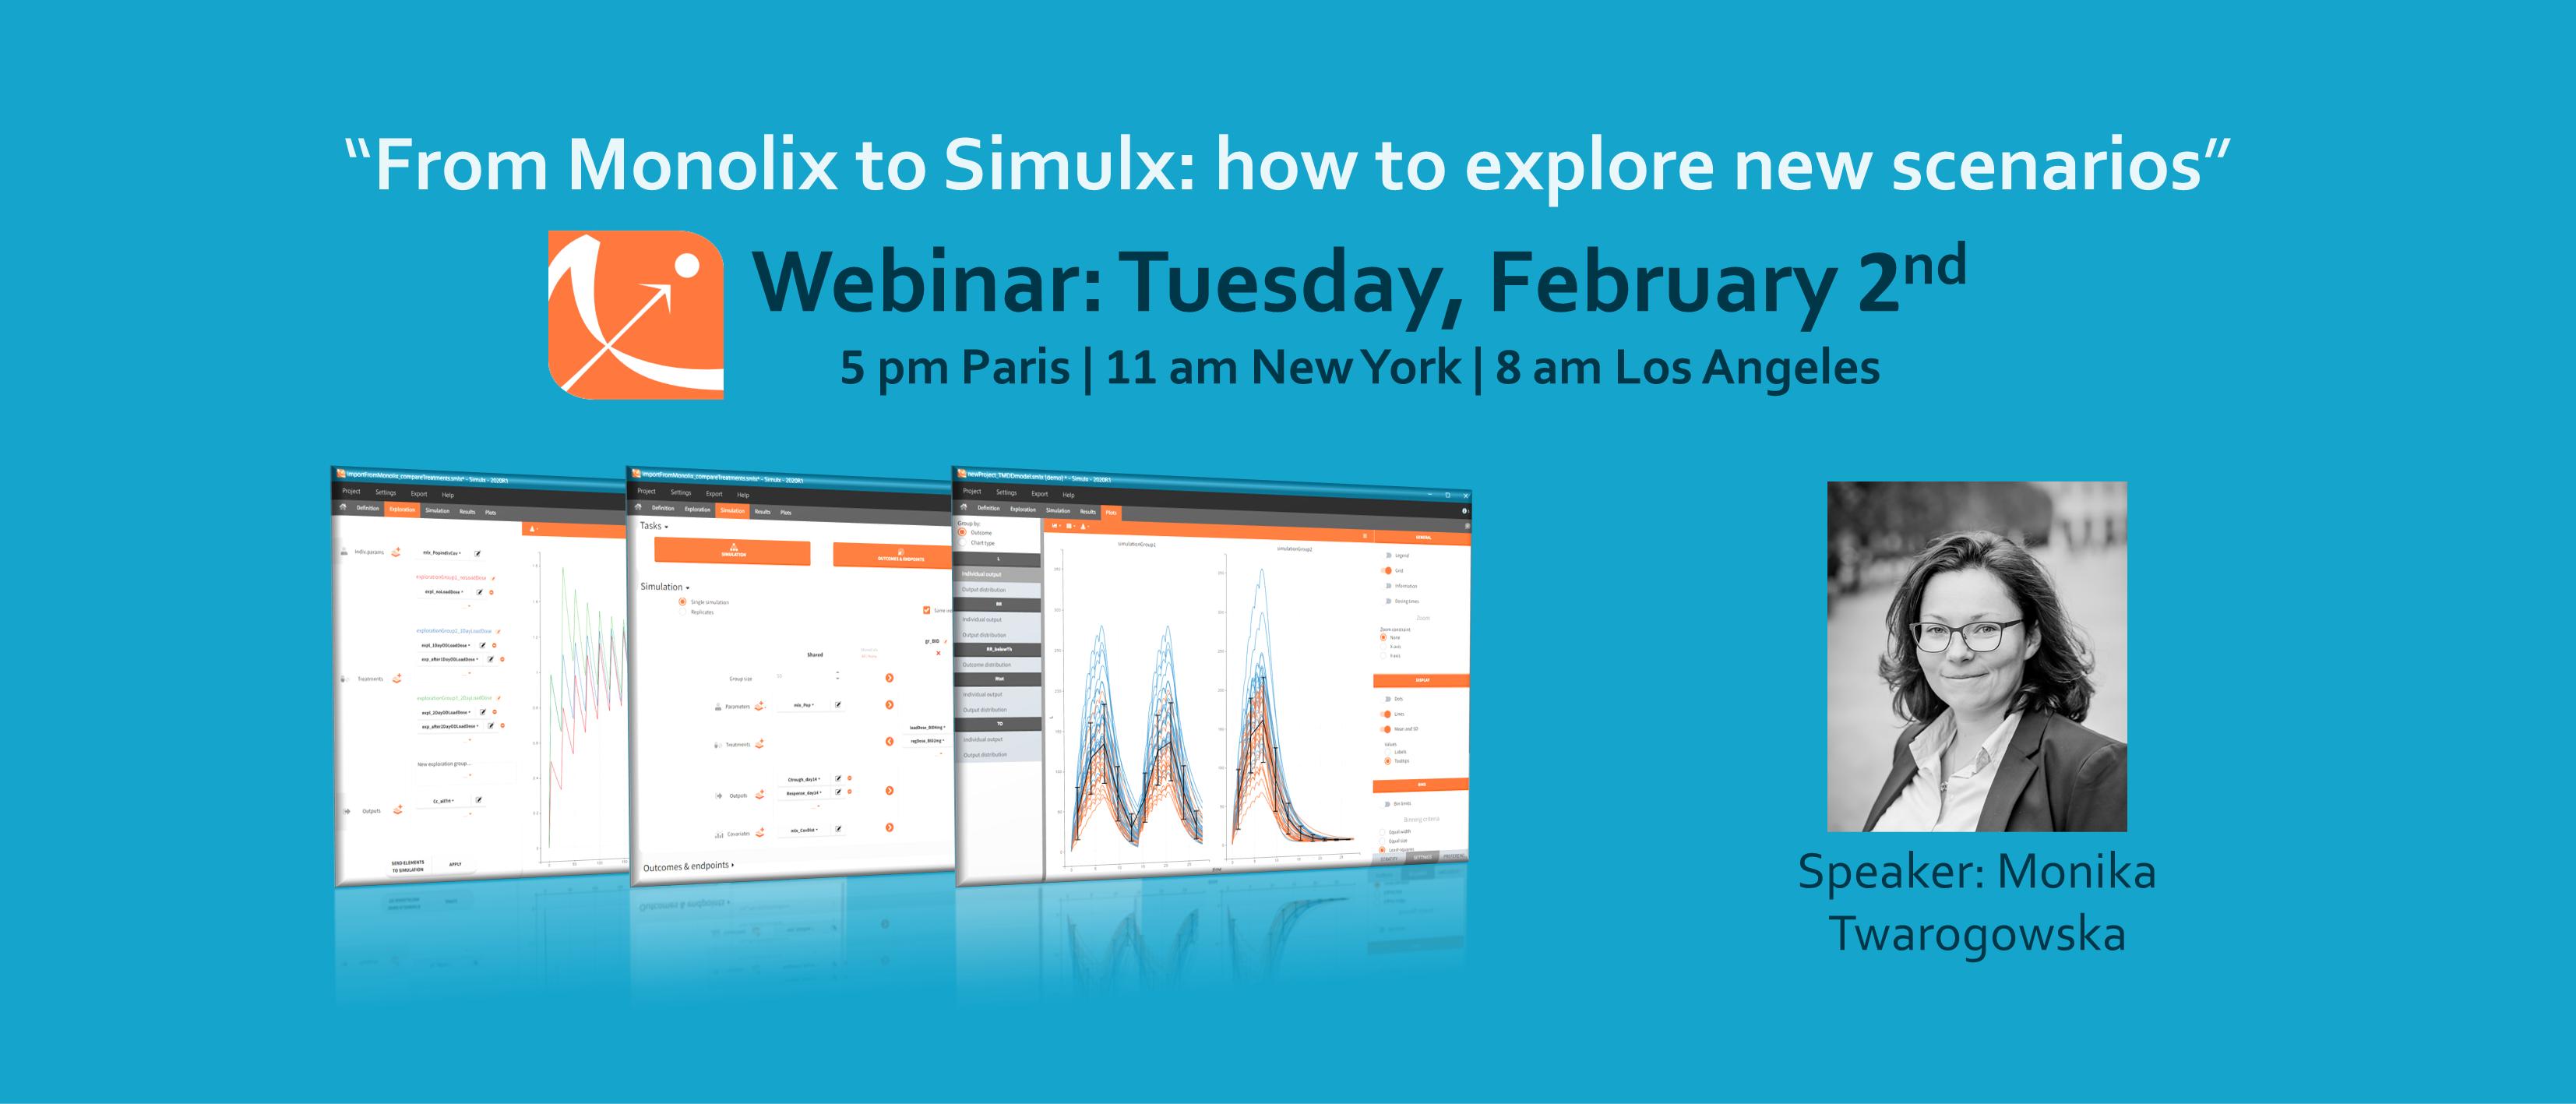 From Monolix to Simulx: how to explore new scenarios